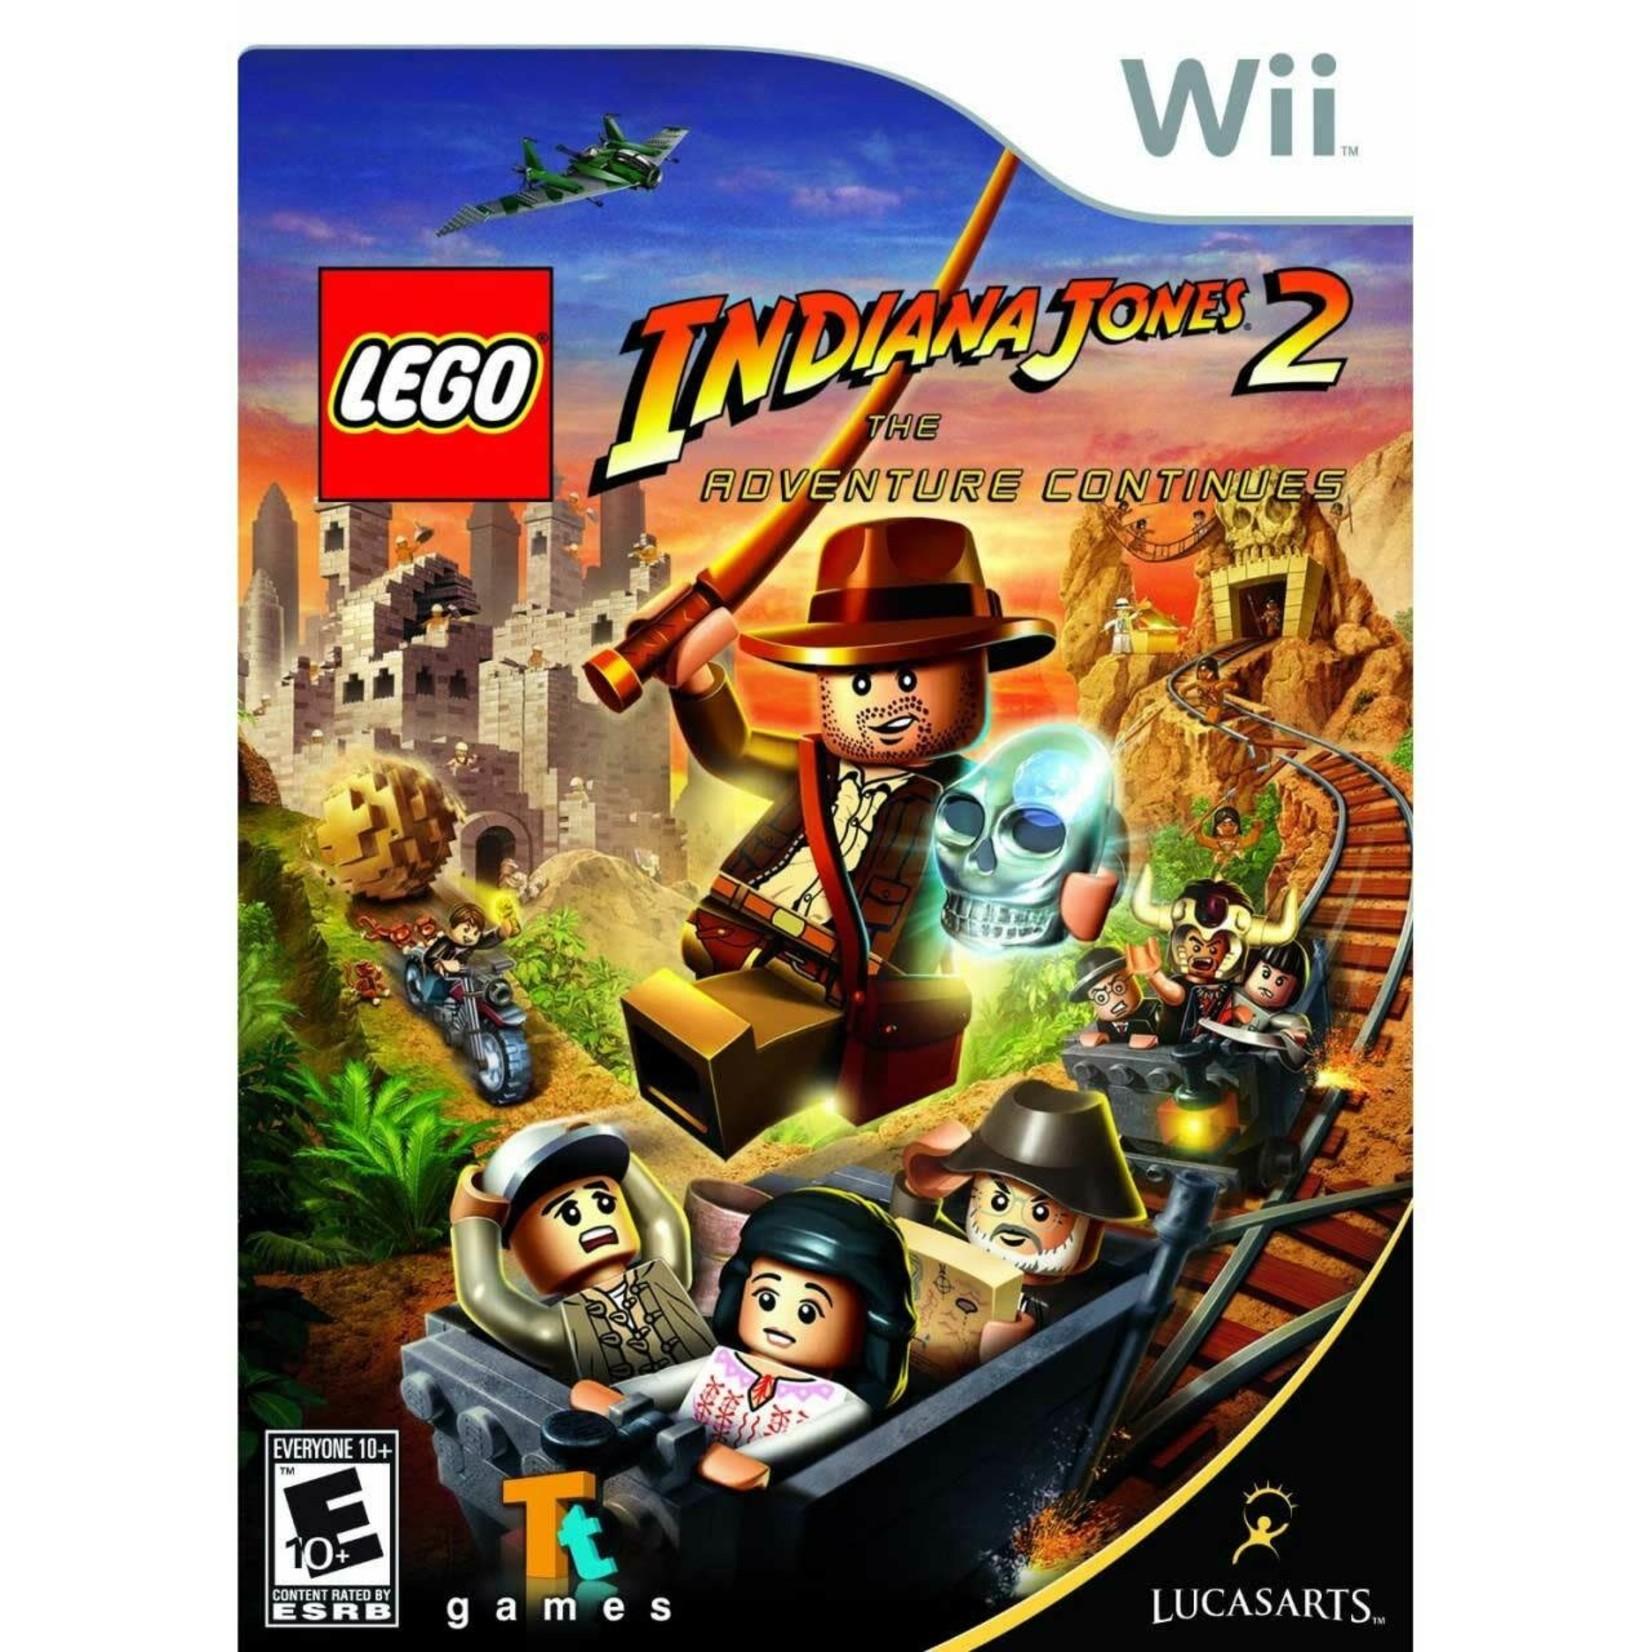 wiiusd-LEGO Indiana Jones 2: The Adventure Continues